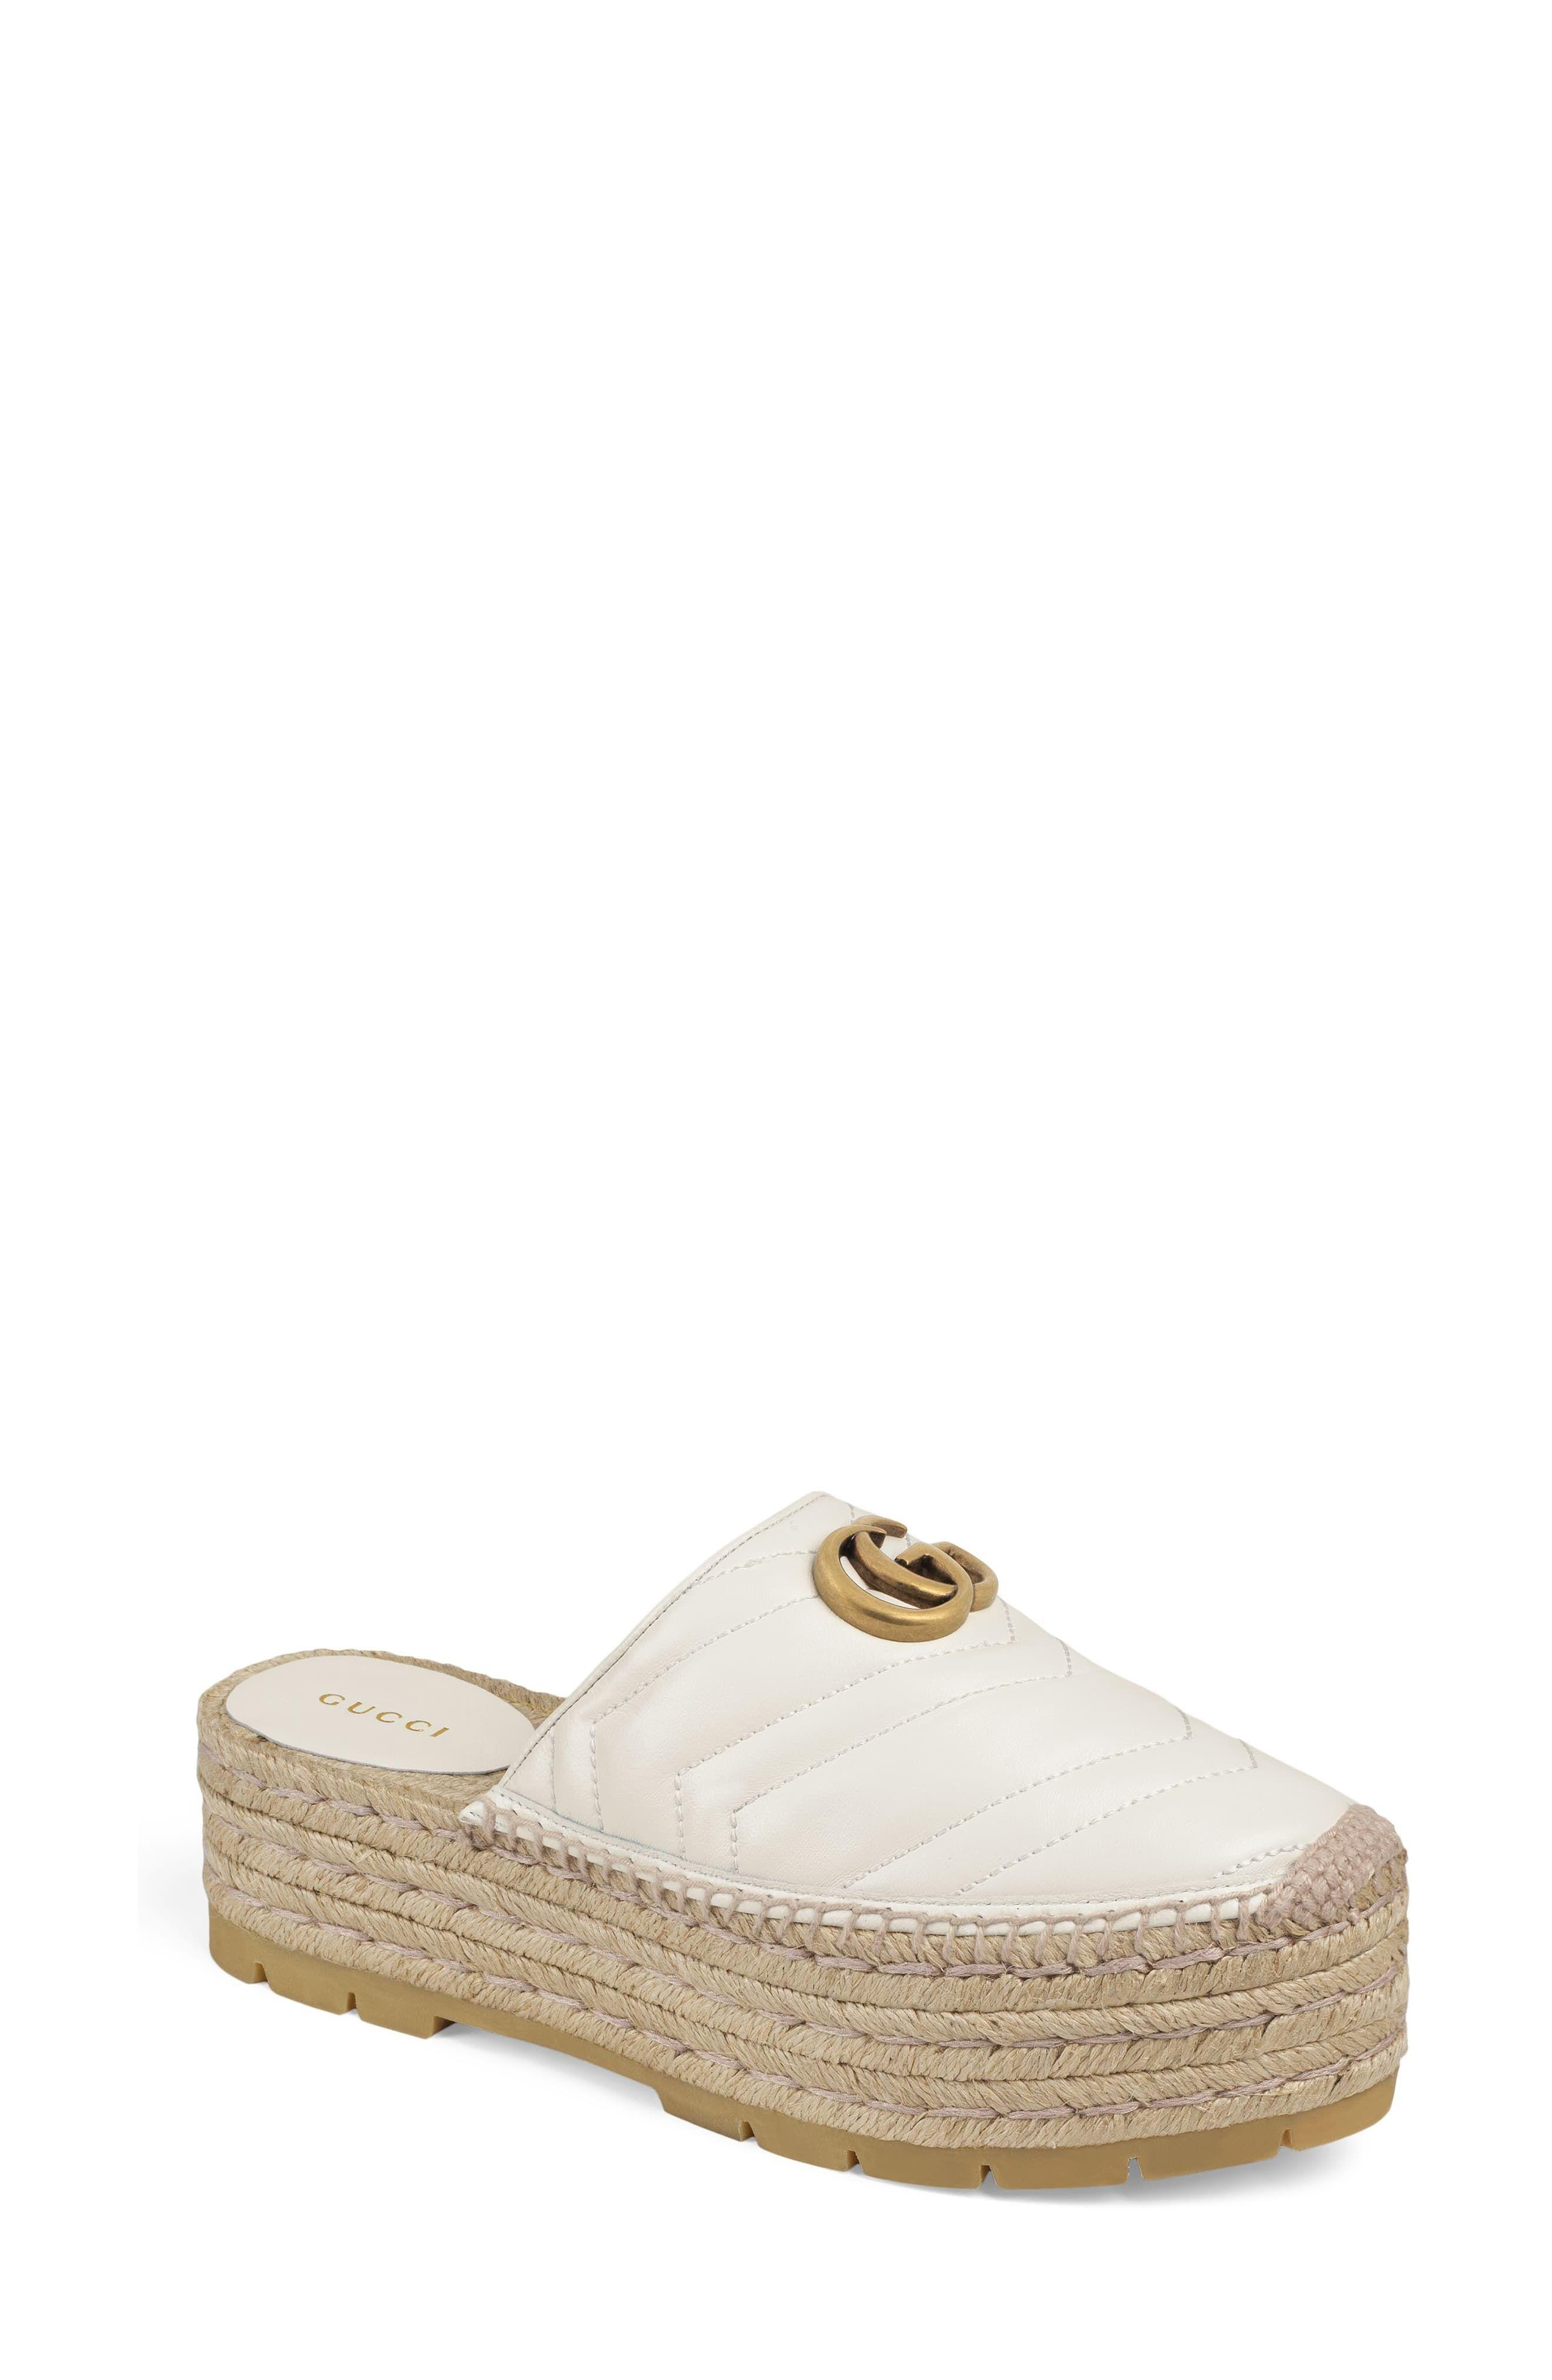 bb0f6da89 Women's Gucci Pilar Platform Espadrille Mule, Size 9.5US / 39.5EU - White